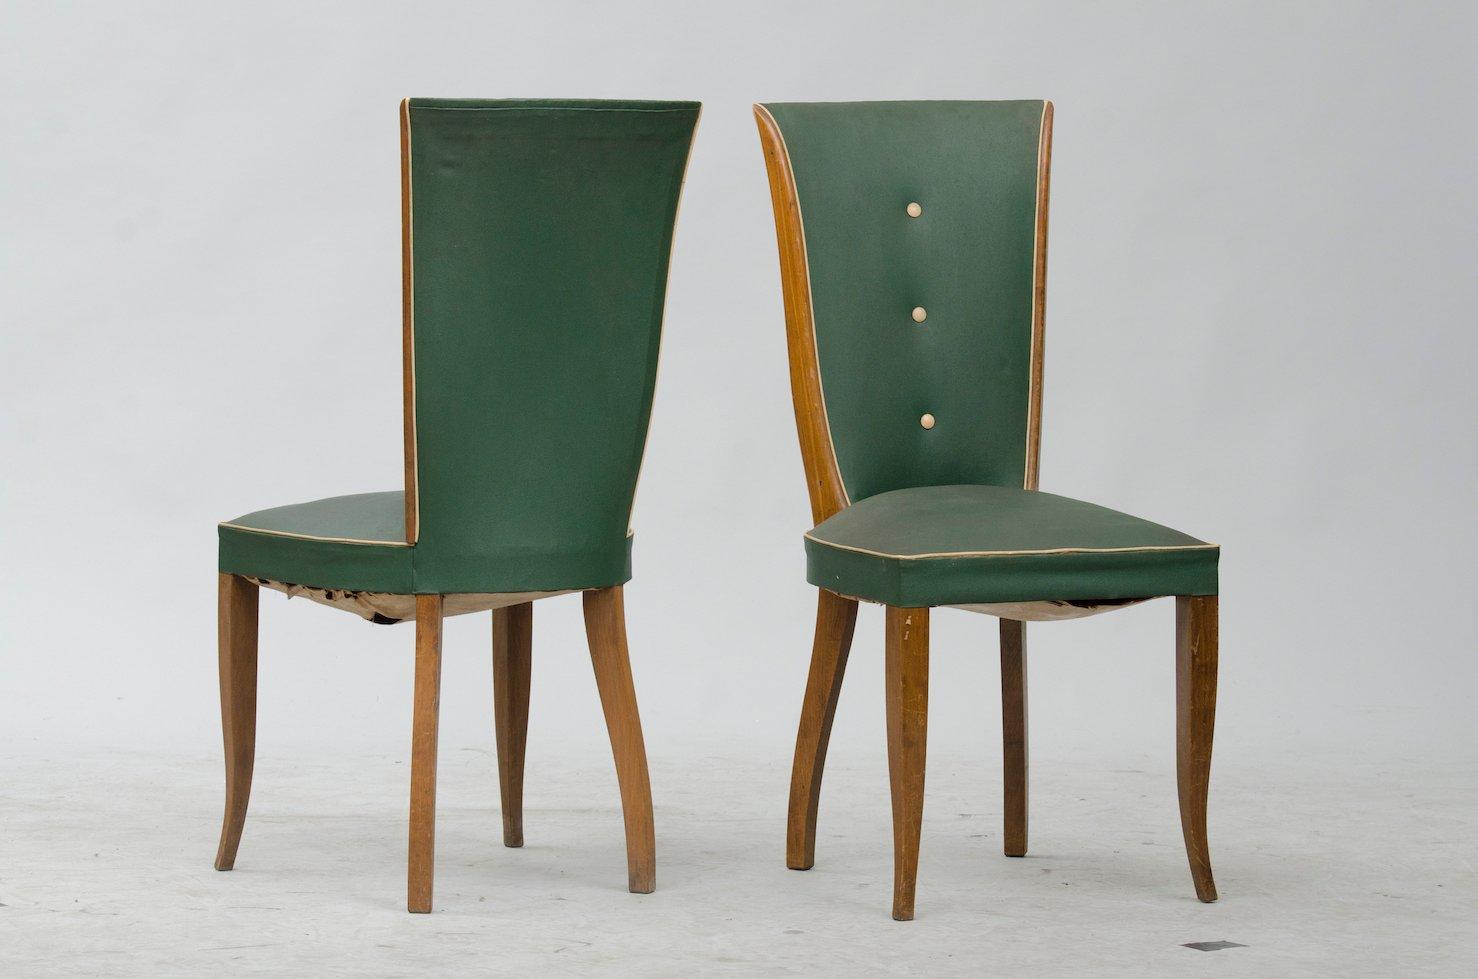 art deco esszimmerst hle 6er set bei pamono kaufen. Black Bedroom Furniture Sets. Home Design Ideas